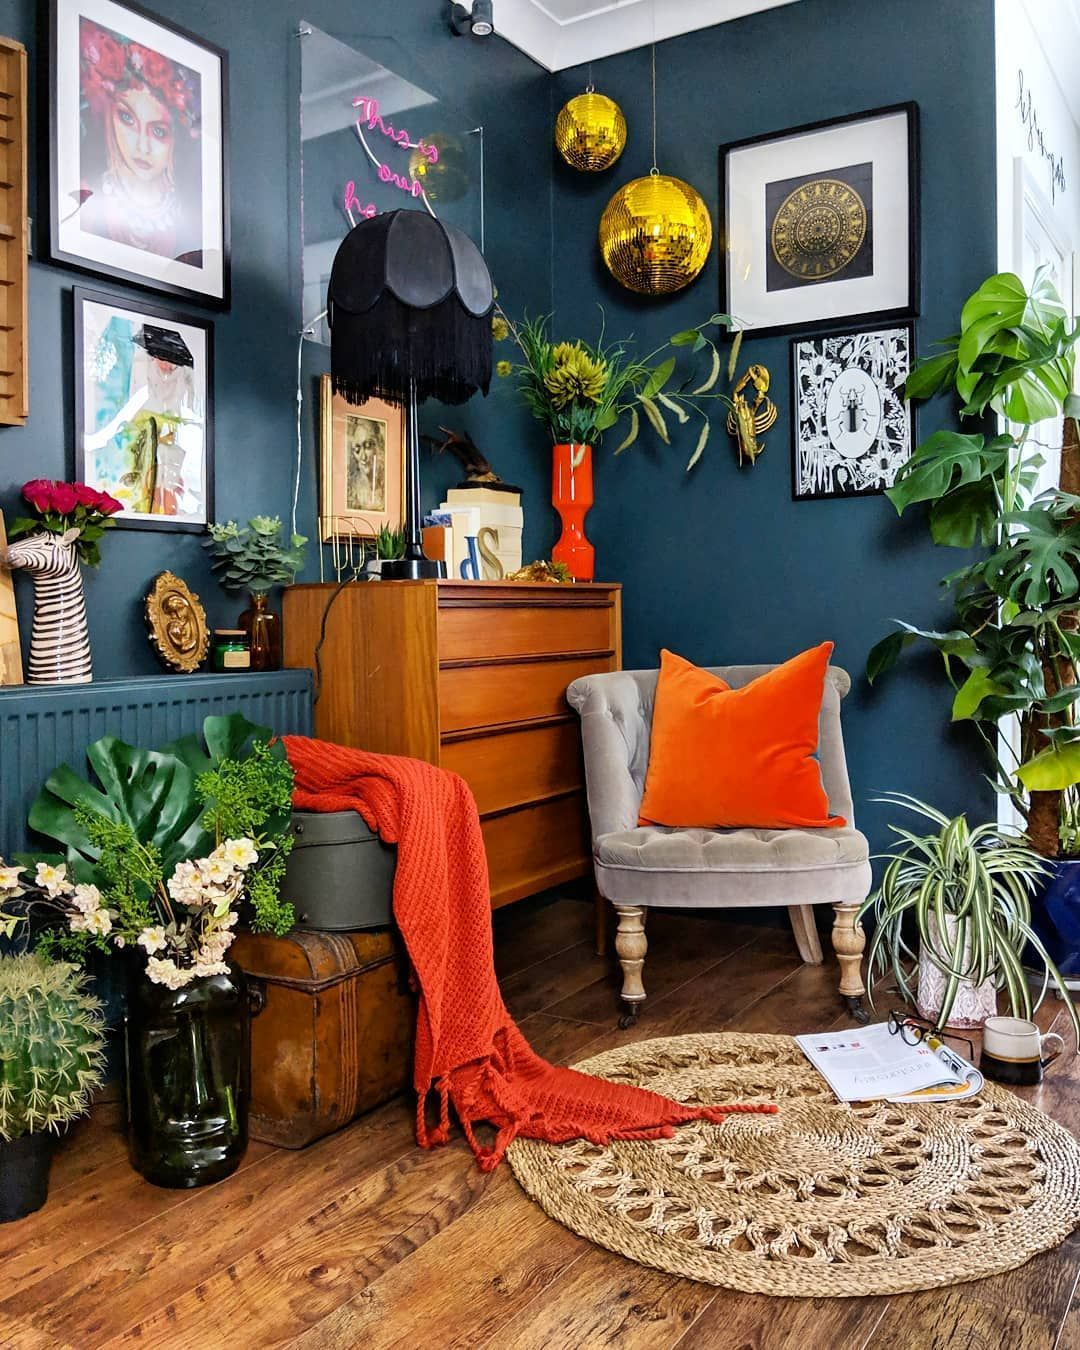 Add the modern decor touch to your home interior design project! #interiordesign #modernhomedecor #midcenturylighting #uniquedesignideas #homedecor #interiordesignideas